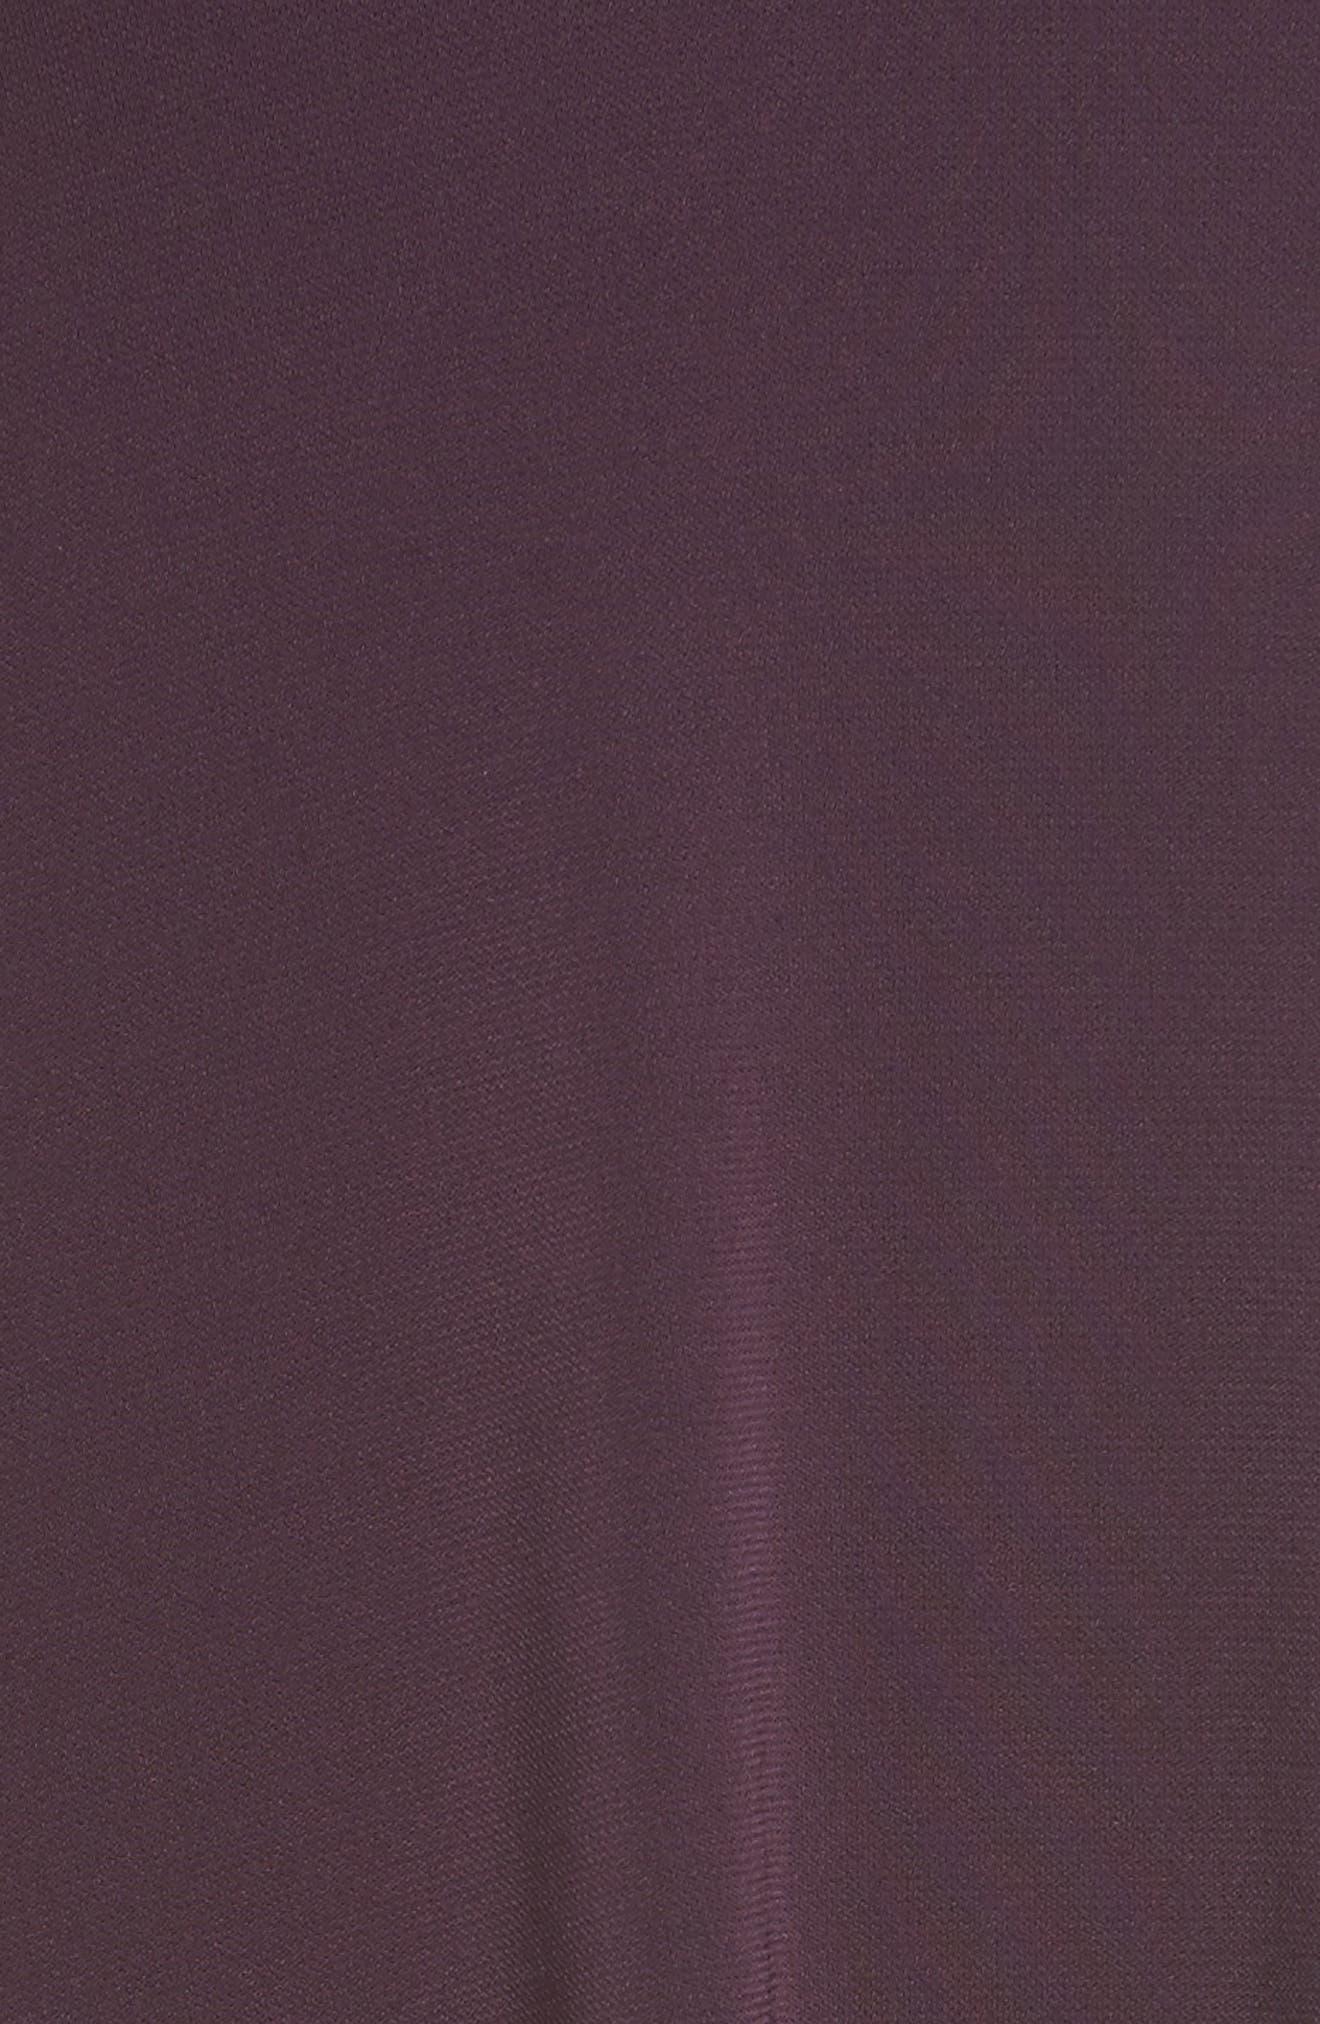 Taylor Flare Sleeve A-Line Dress,                             Alternate thumbnail 5, color,                             Eggplant